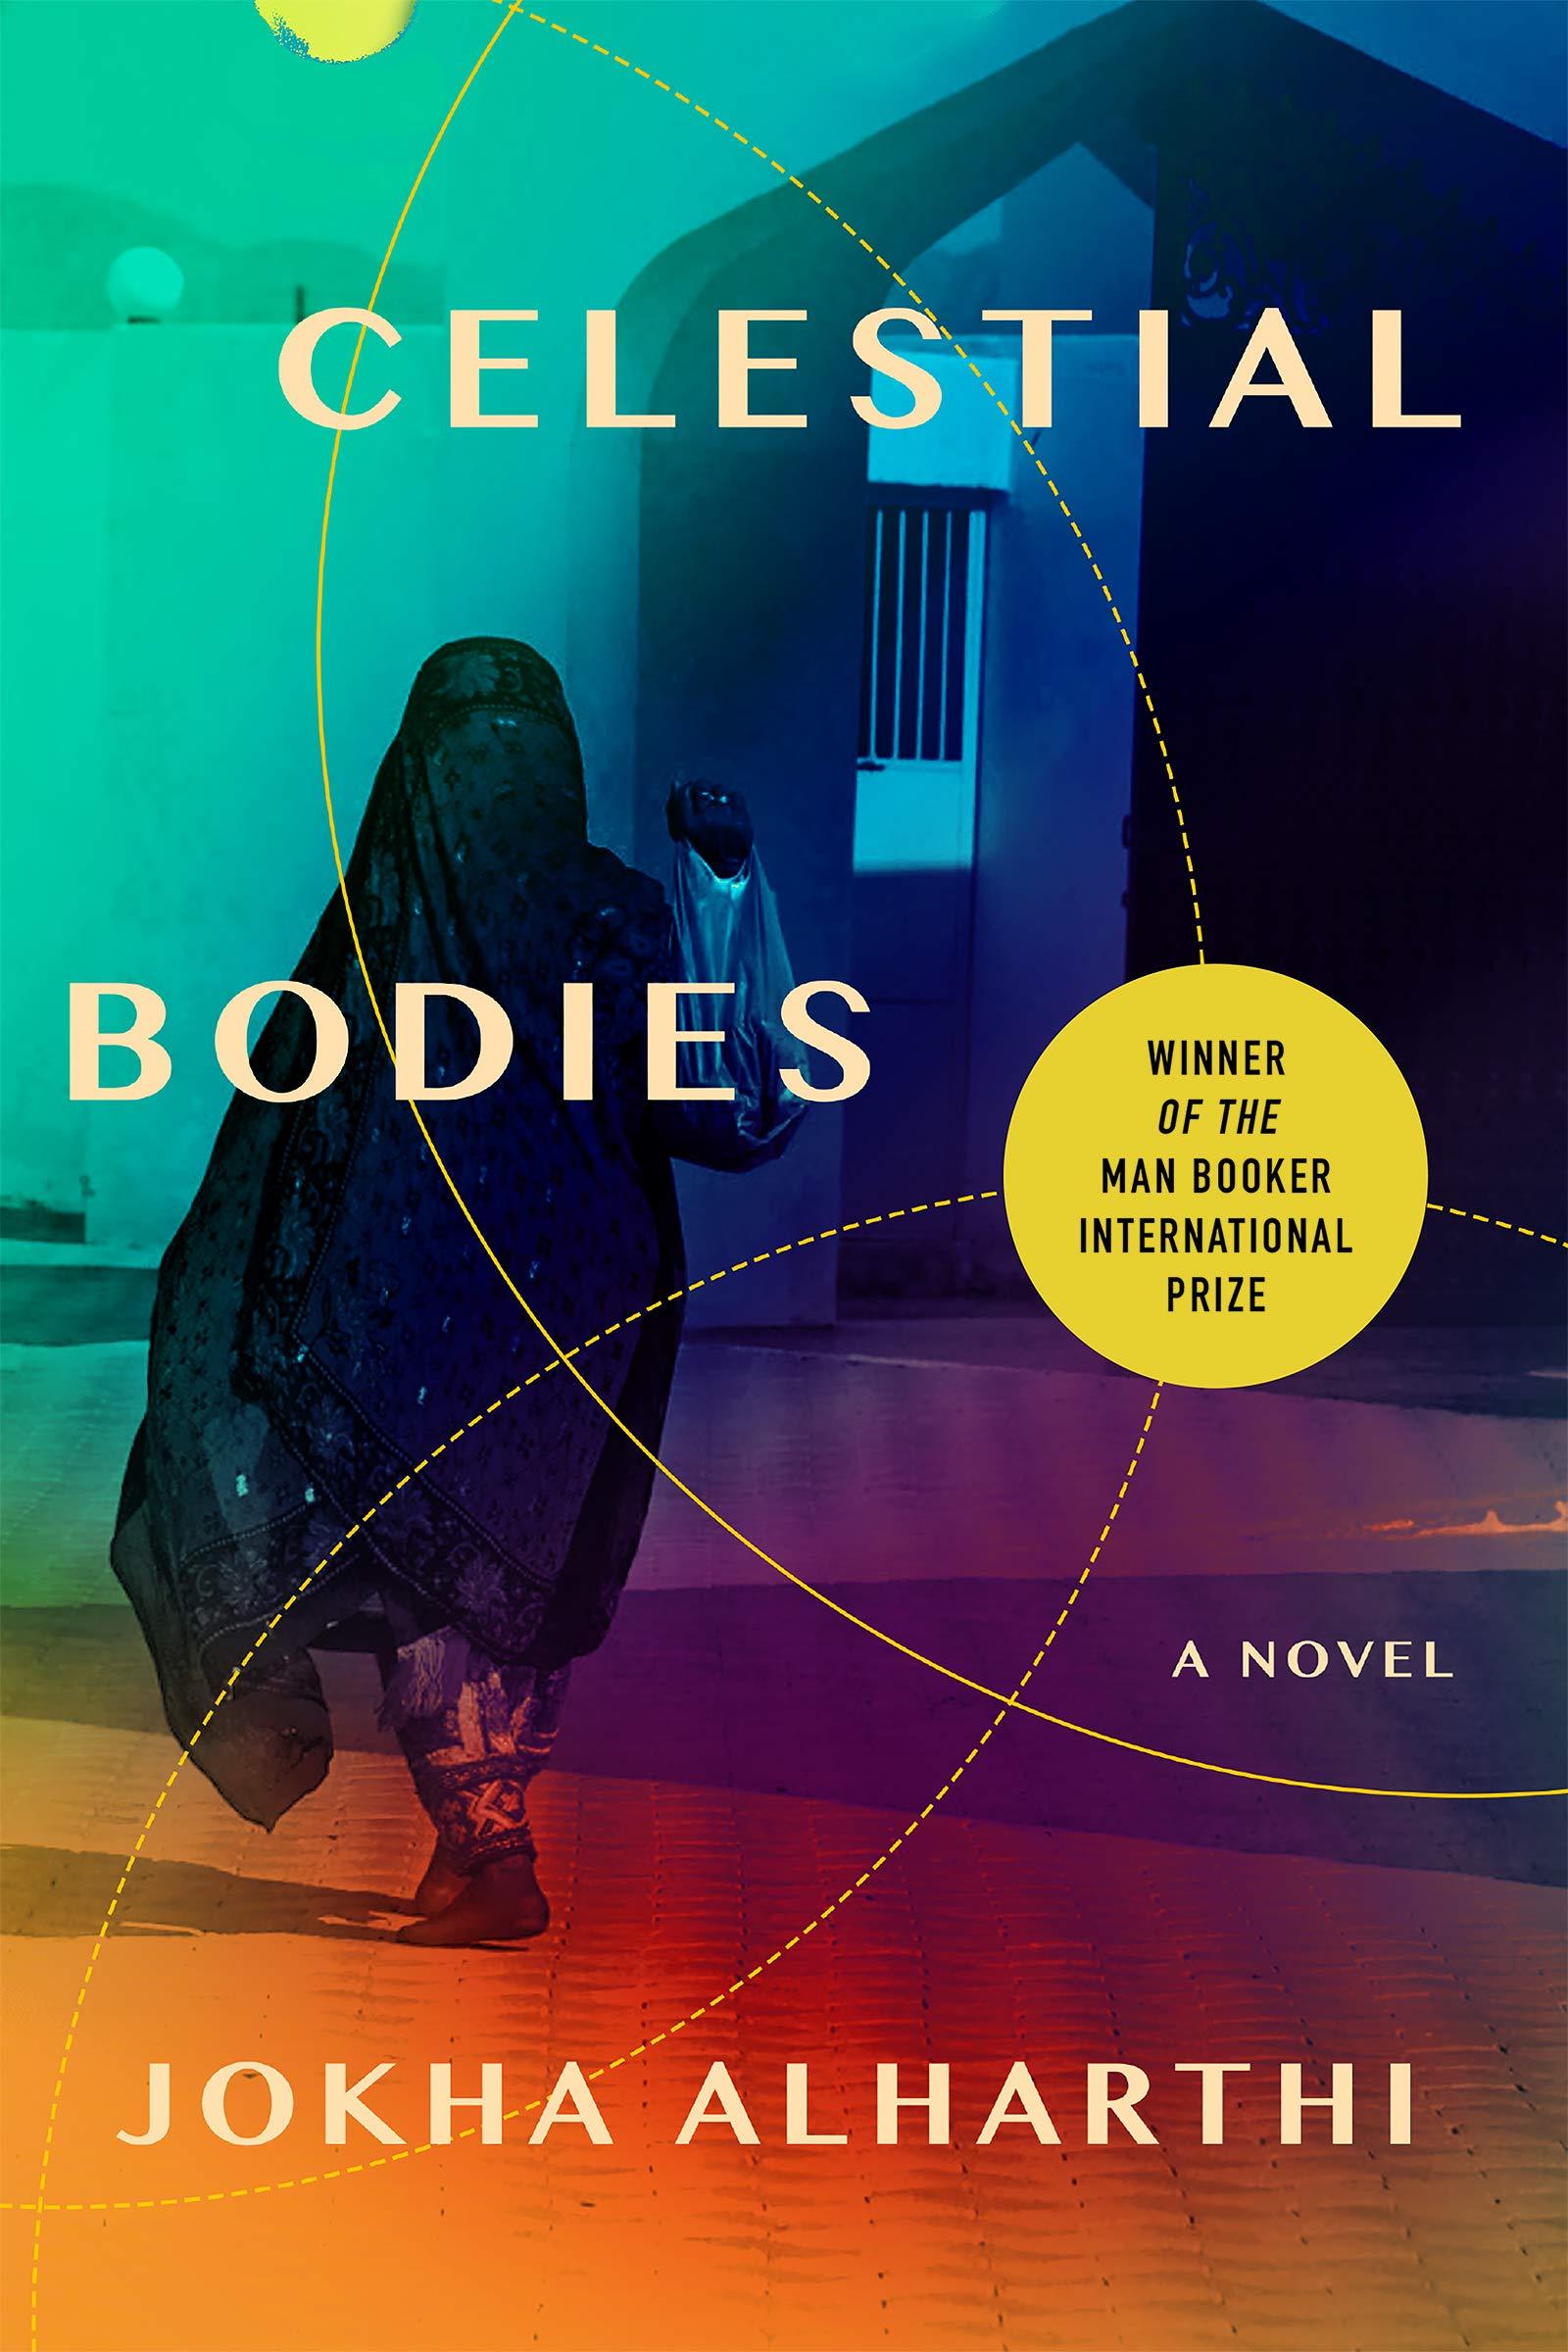 Celestial Bodies by Jokha al-Harthi